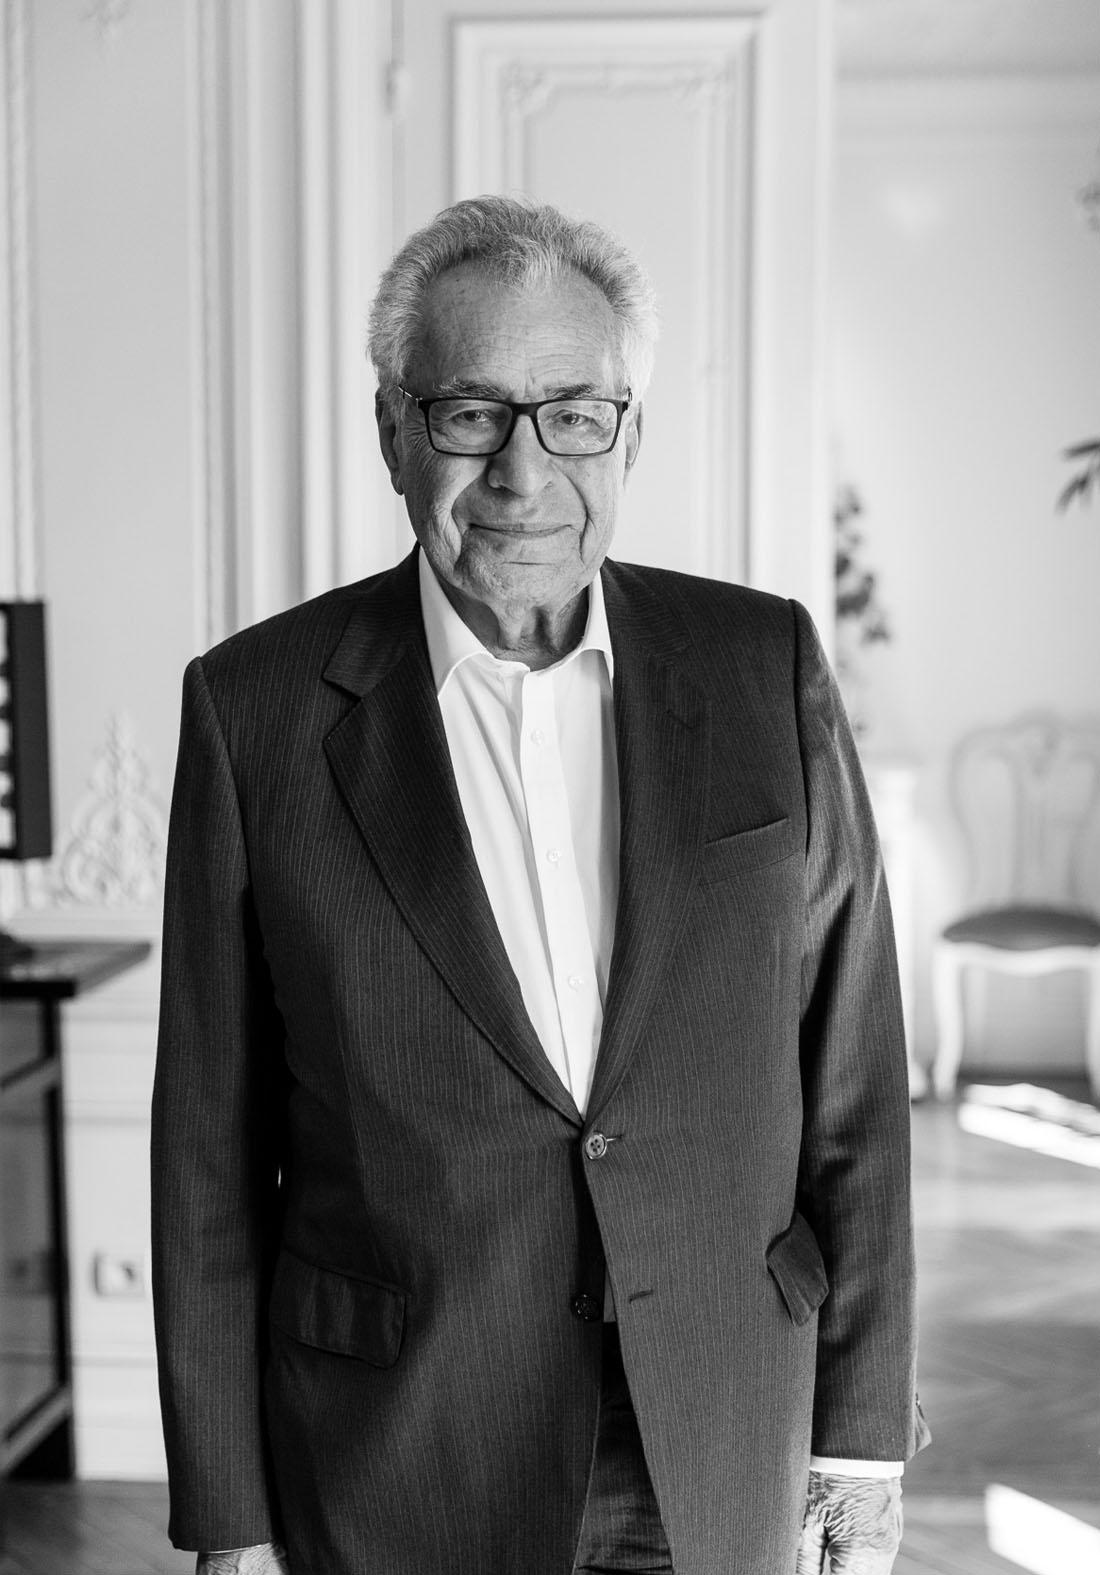 Jean-Claude PICK